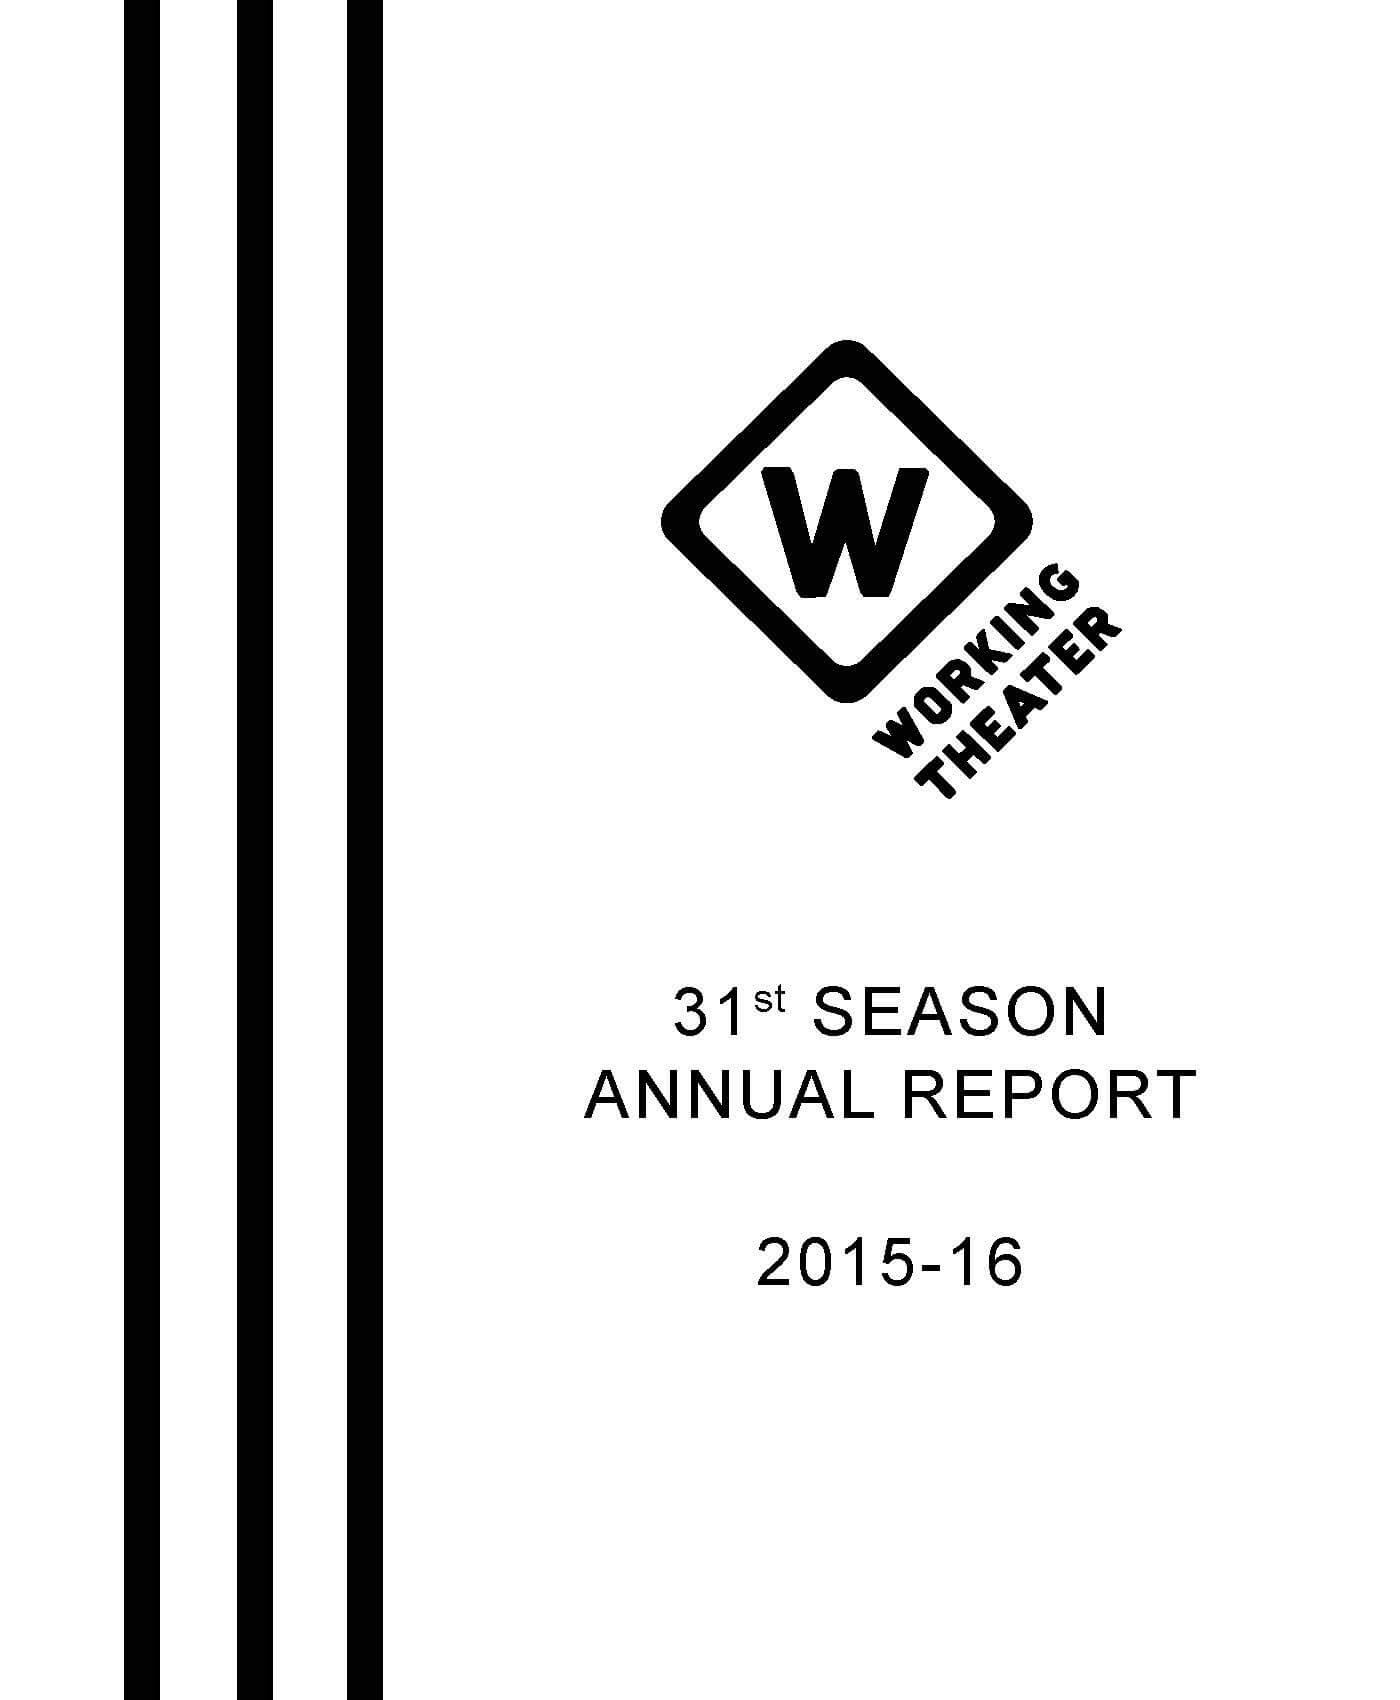 31st season annual report